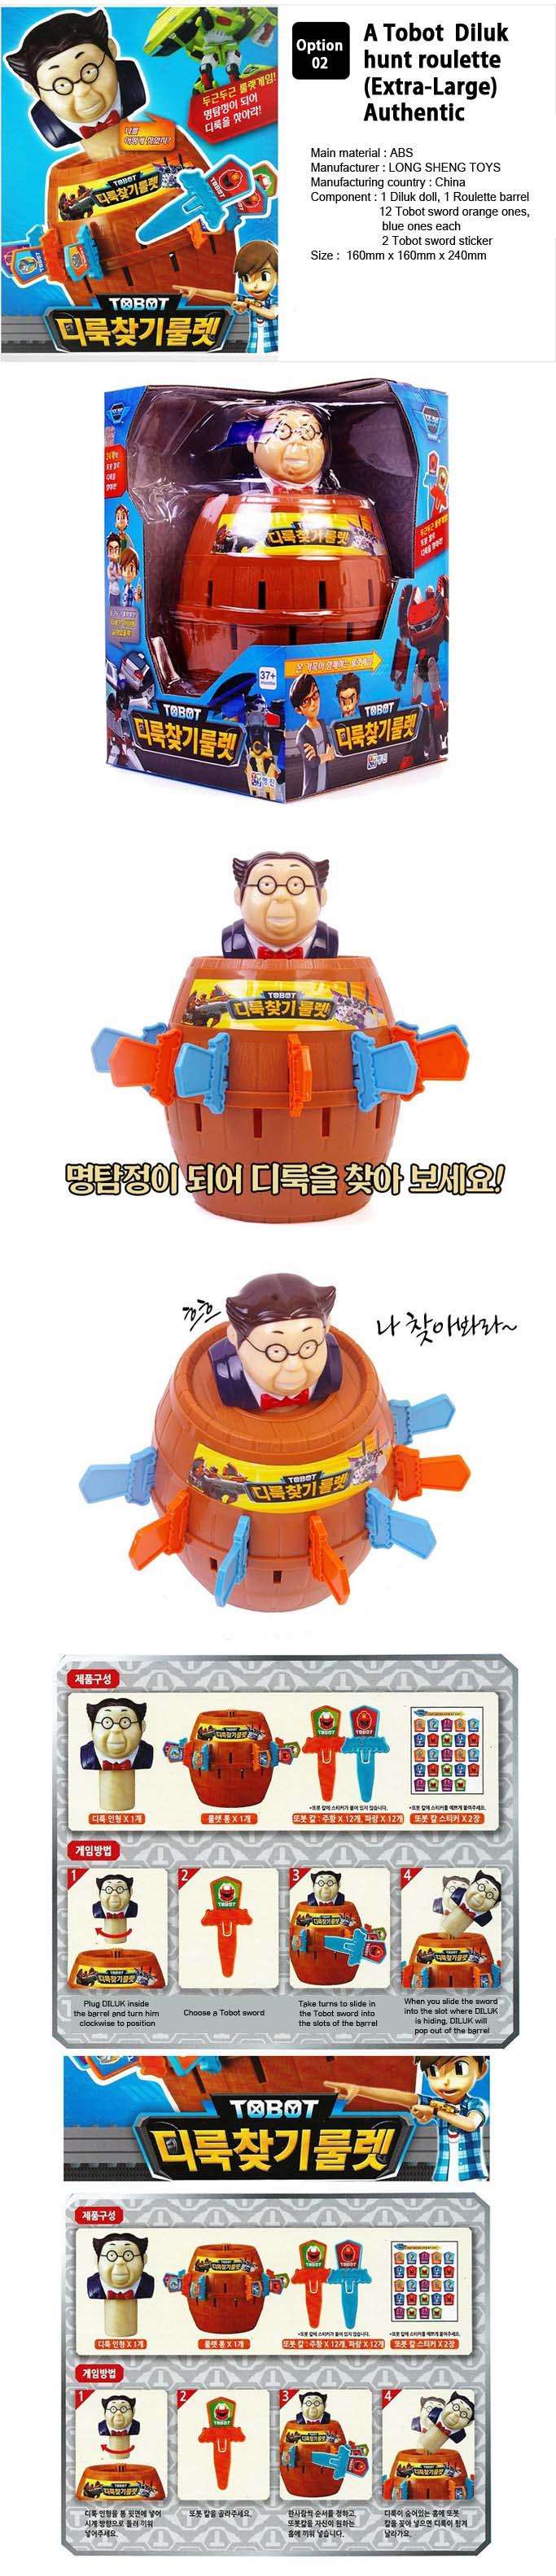 Pirate Roulette Barrels Running Man Korean Games Daftar Update Mainan Barrel King Big Size Game Gamerunning Original And Genuin Made In Korea